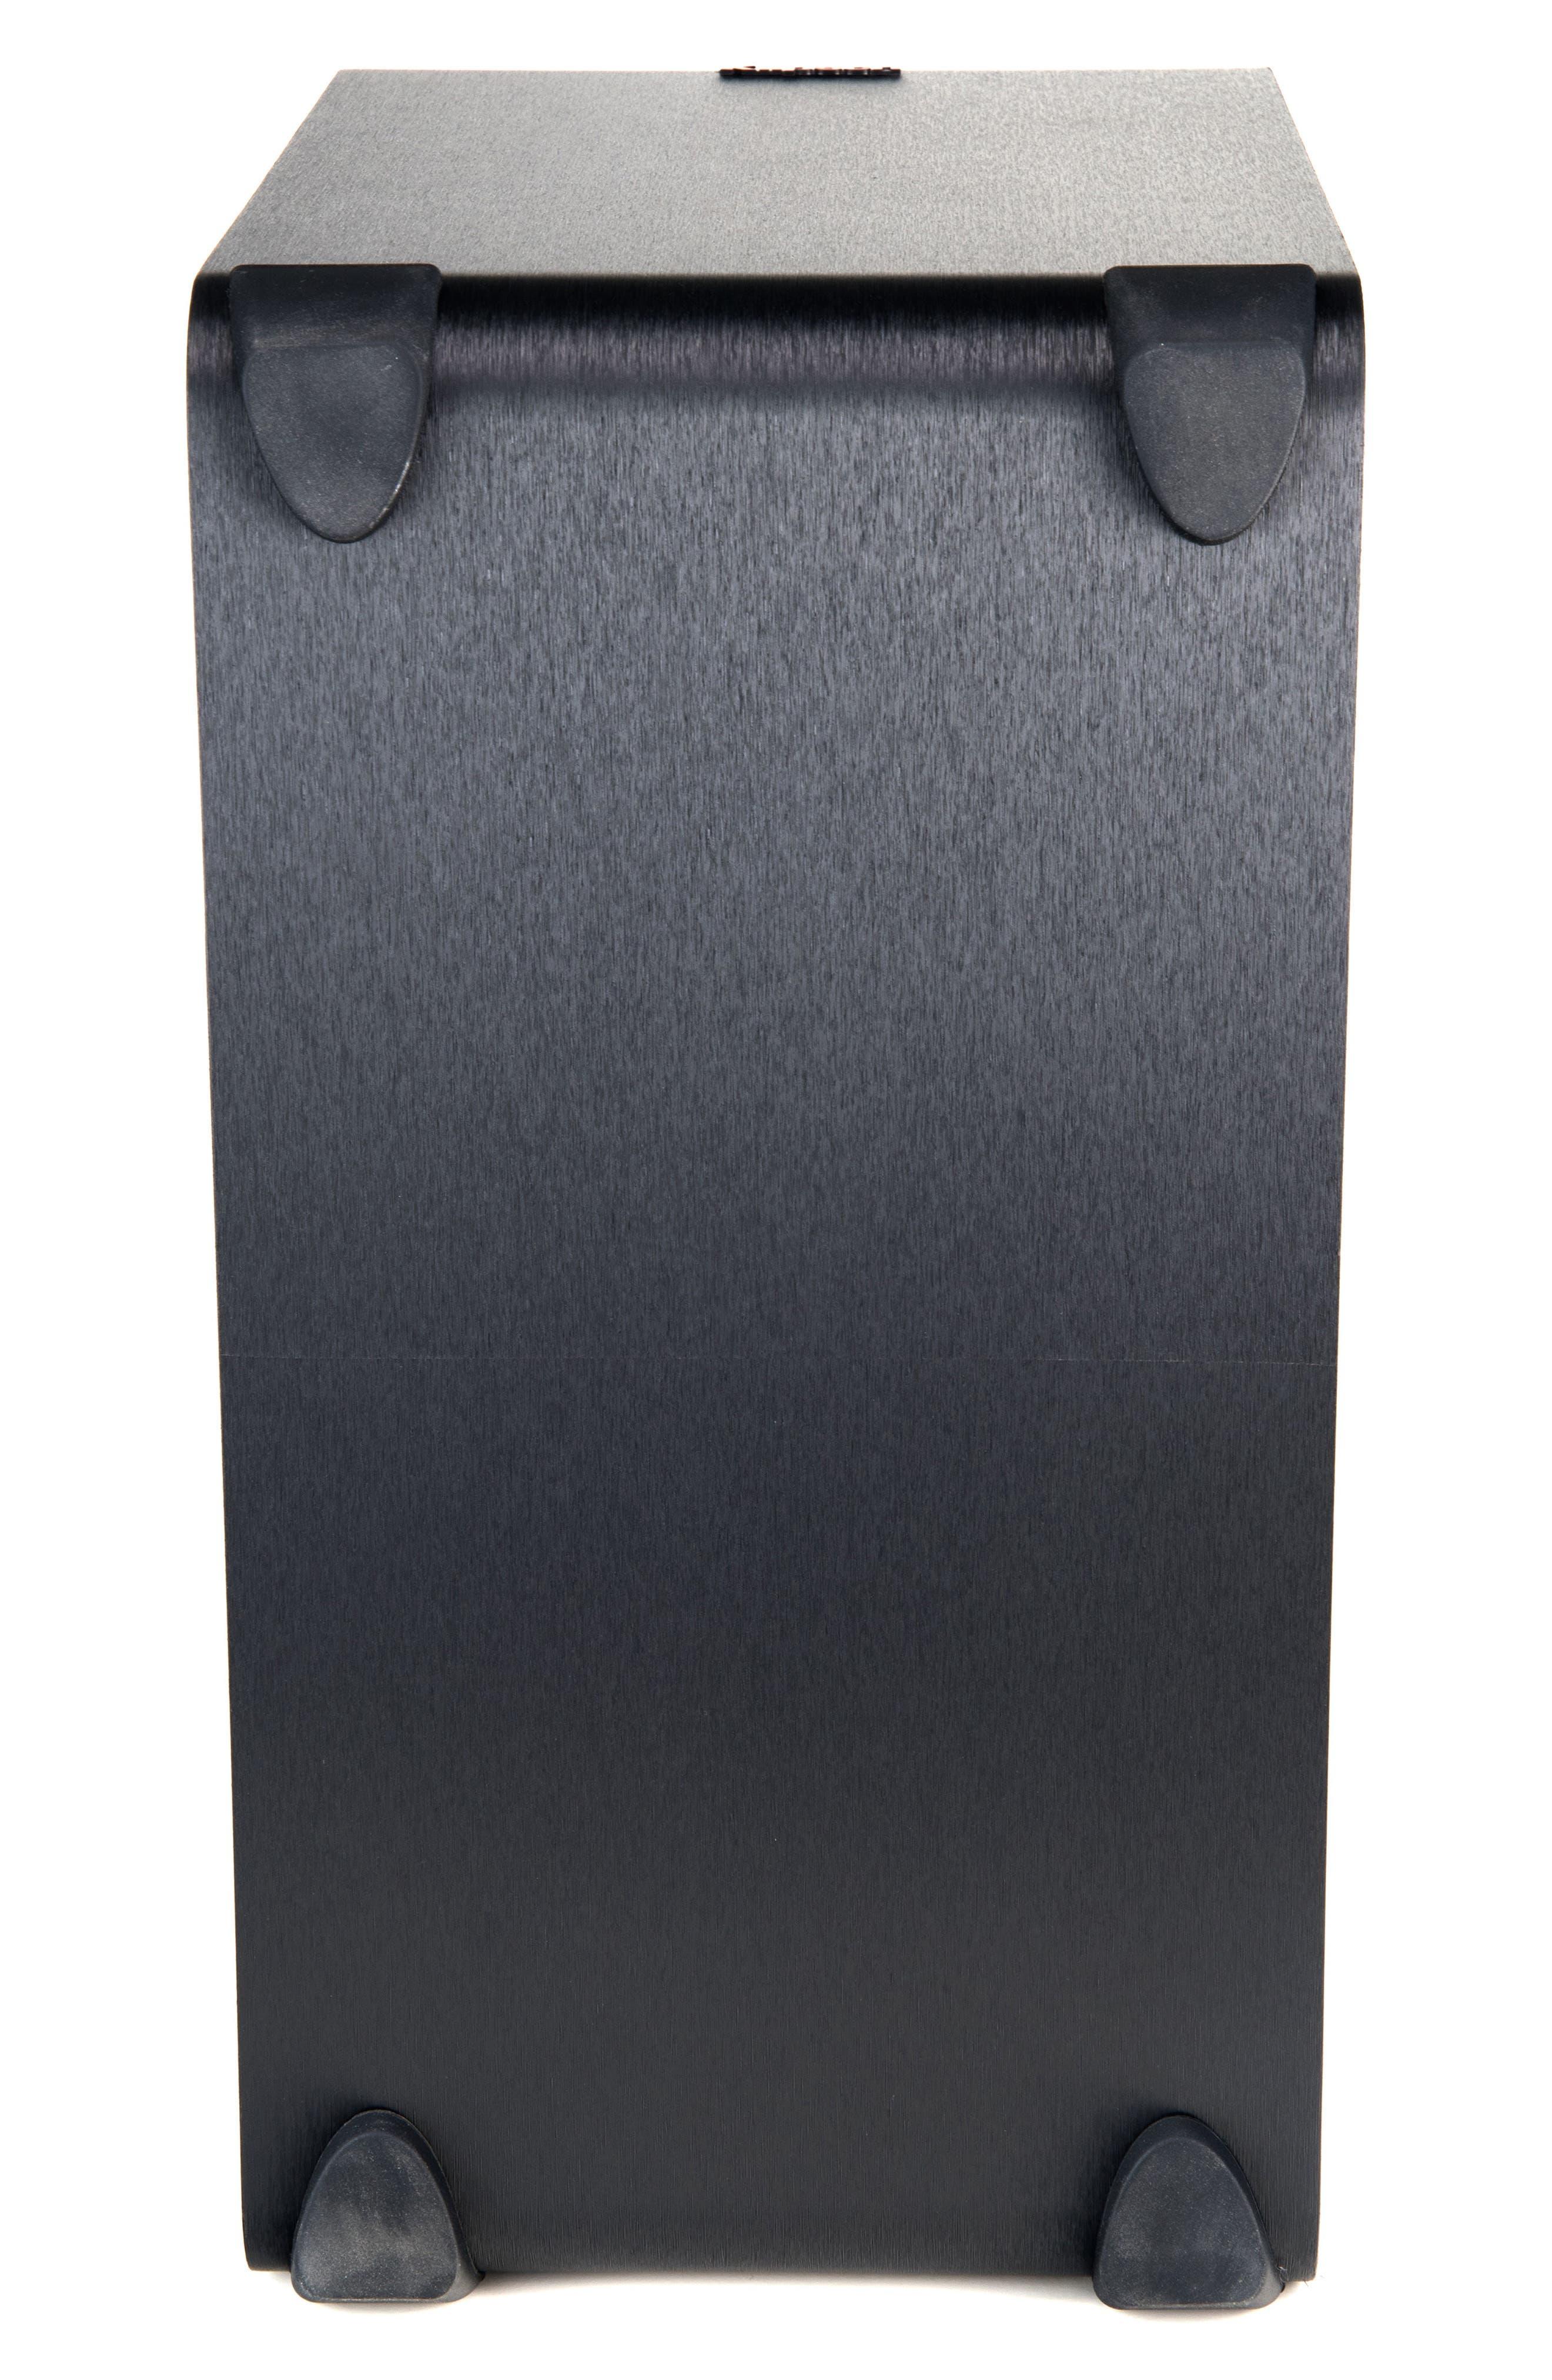 RSB-11 Soundbar & Subwoofer,                             Alternate thumbnail 2, color,                             Black